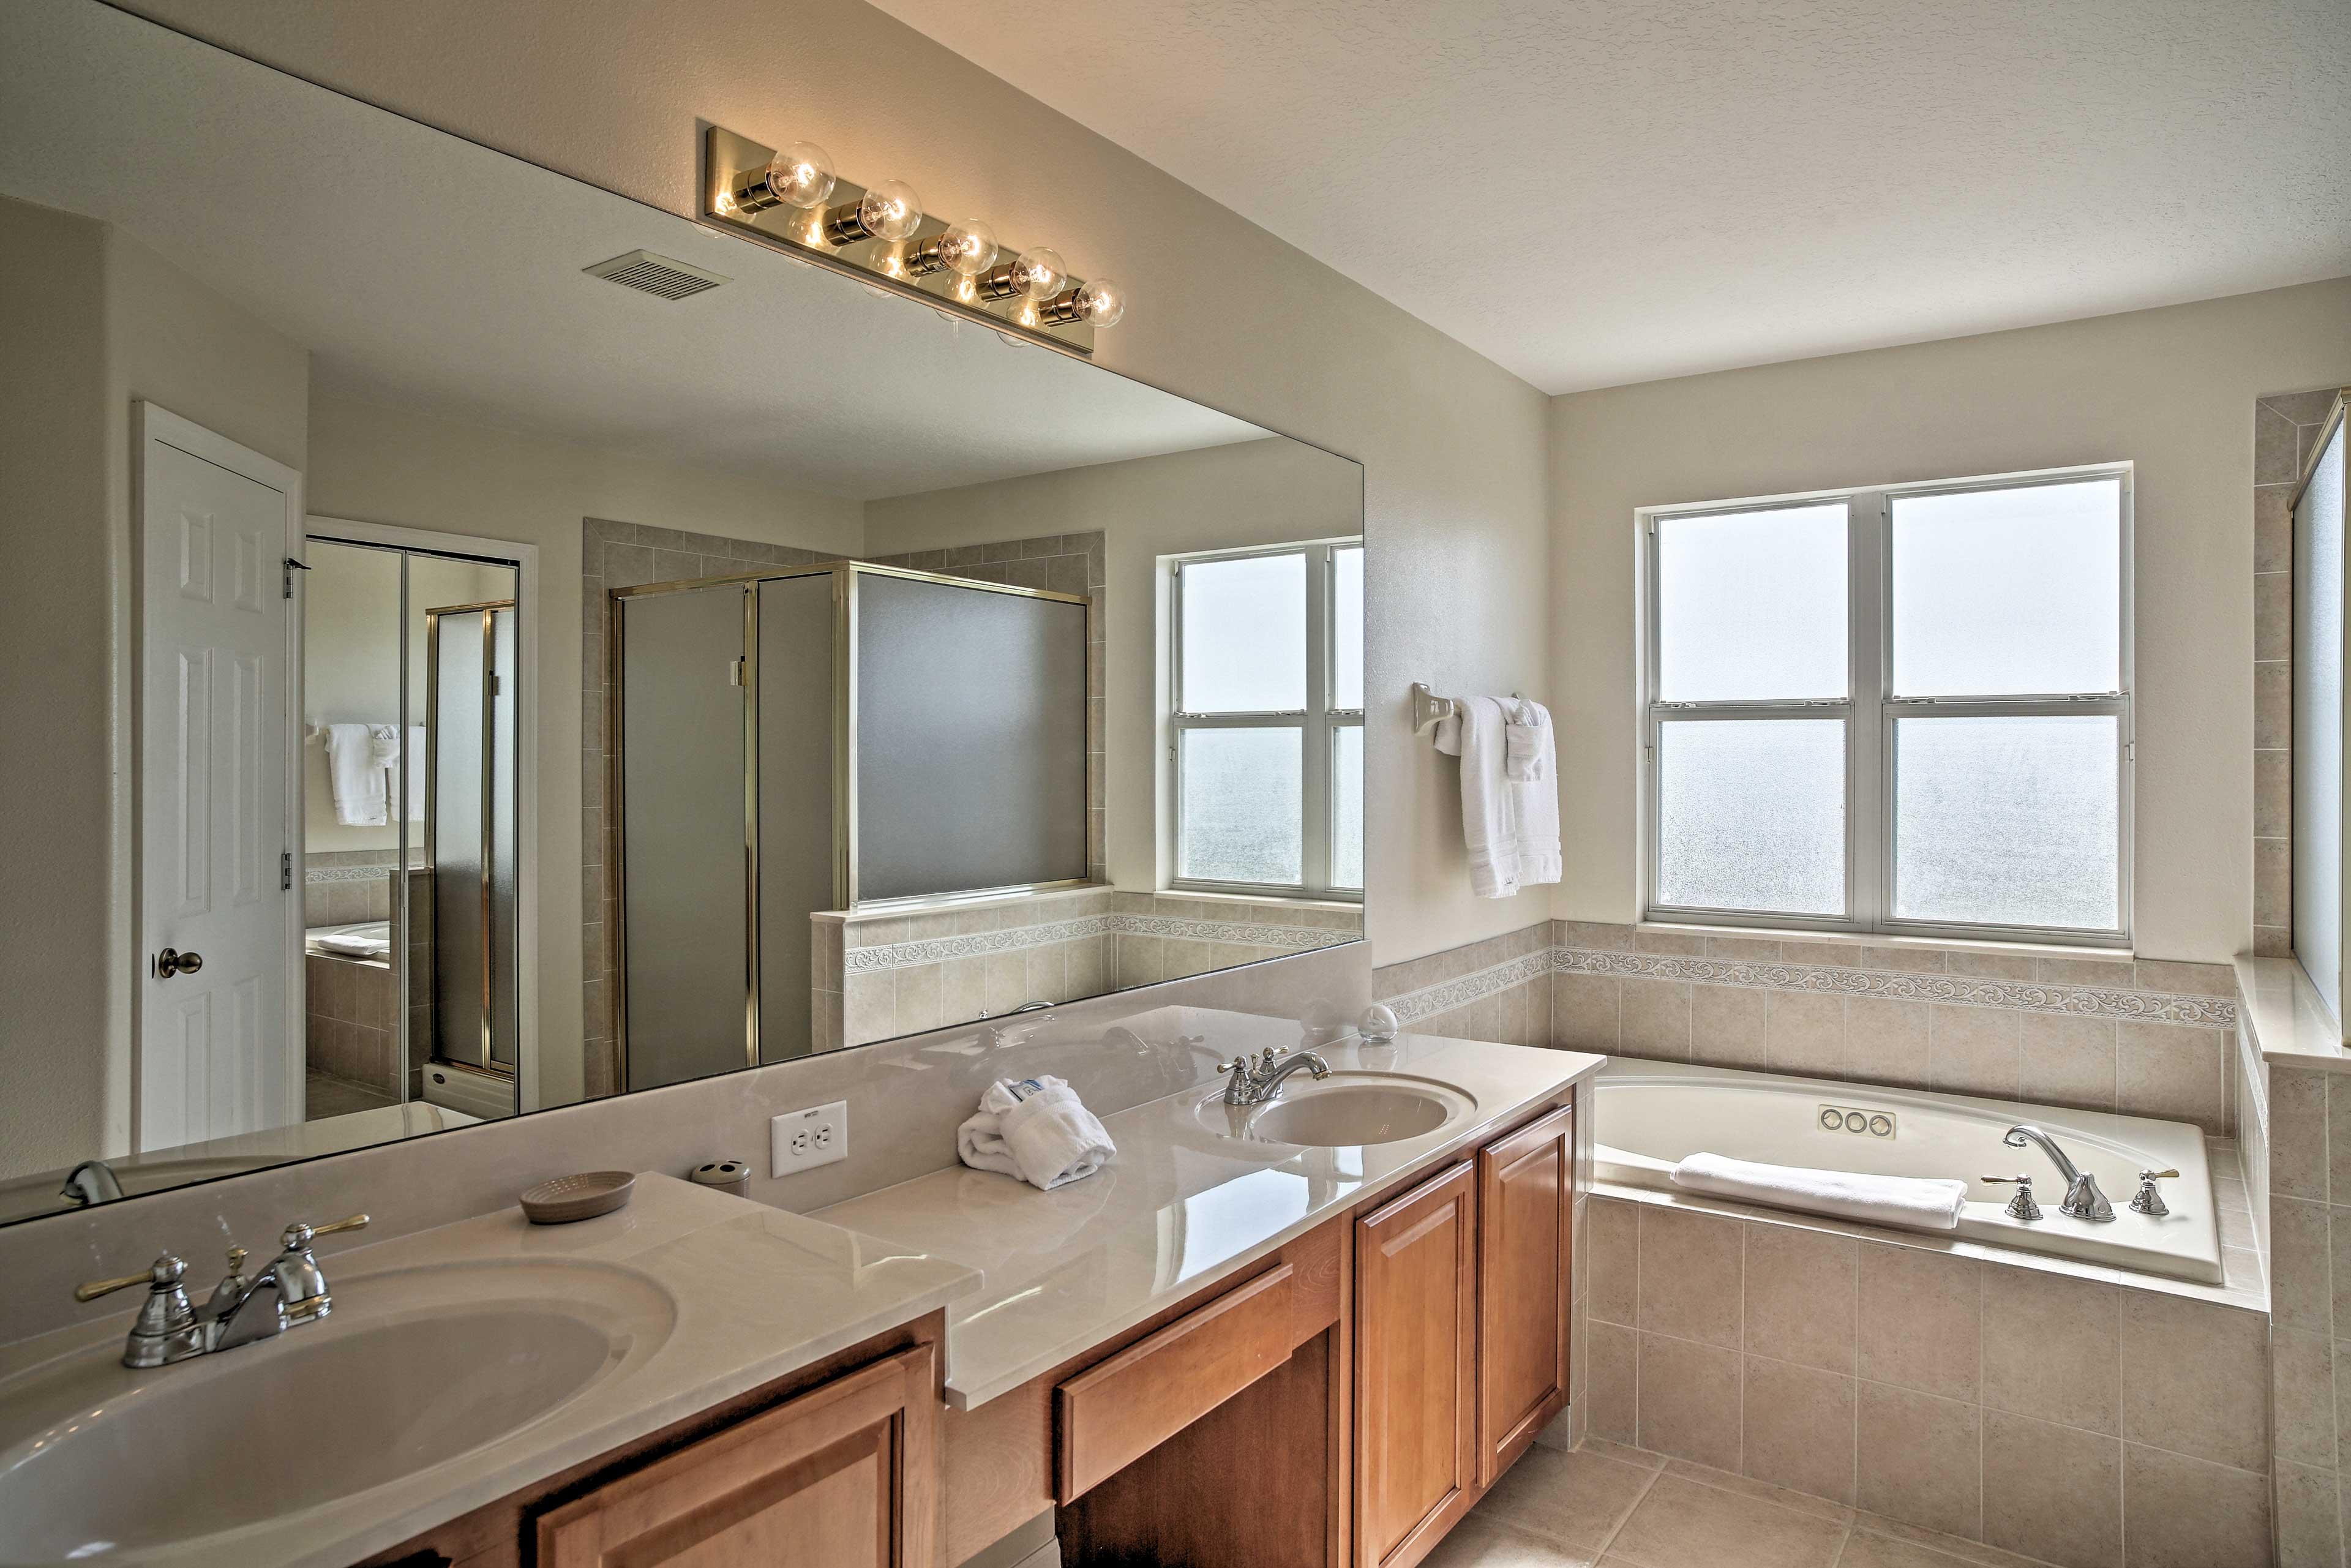 The master bath boasts a soaking tub and walk-in shower.